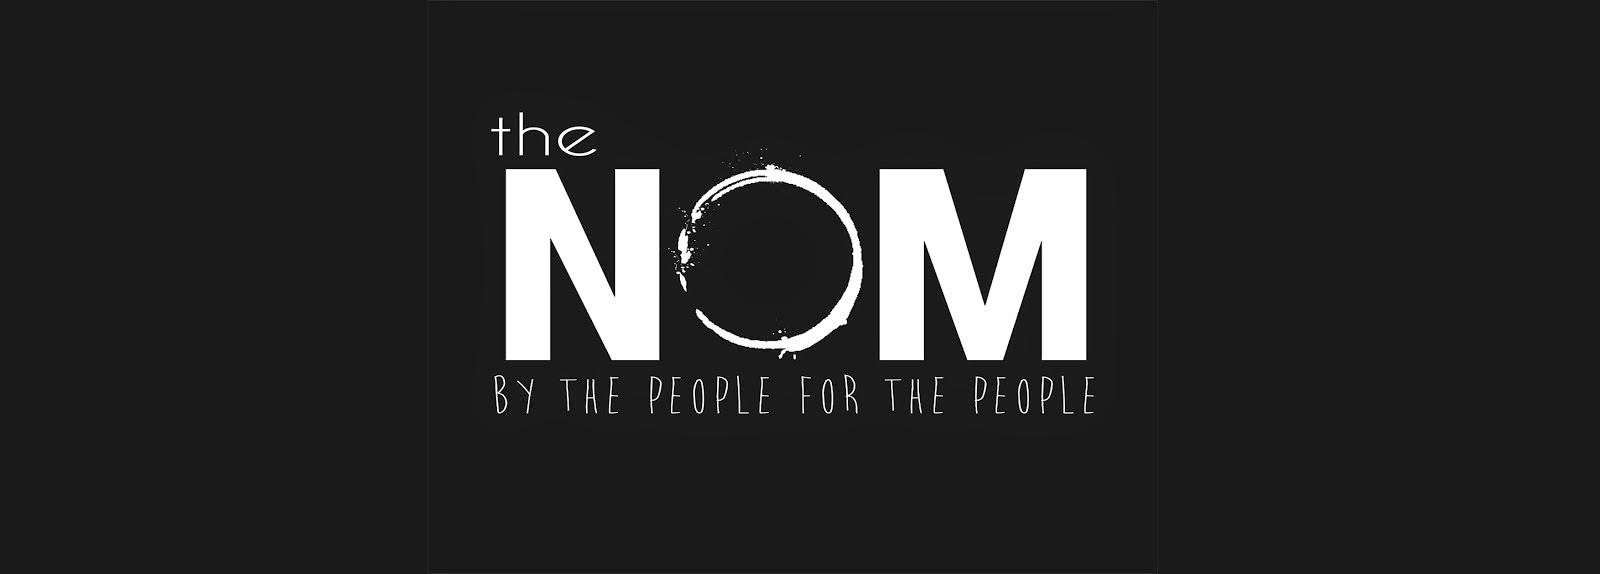 the nom.